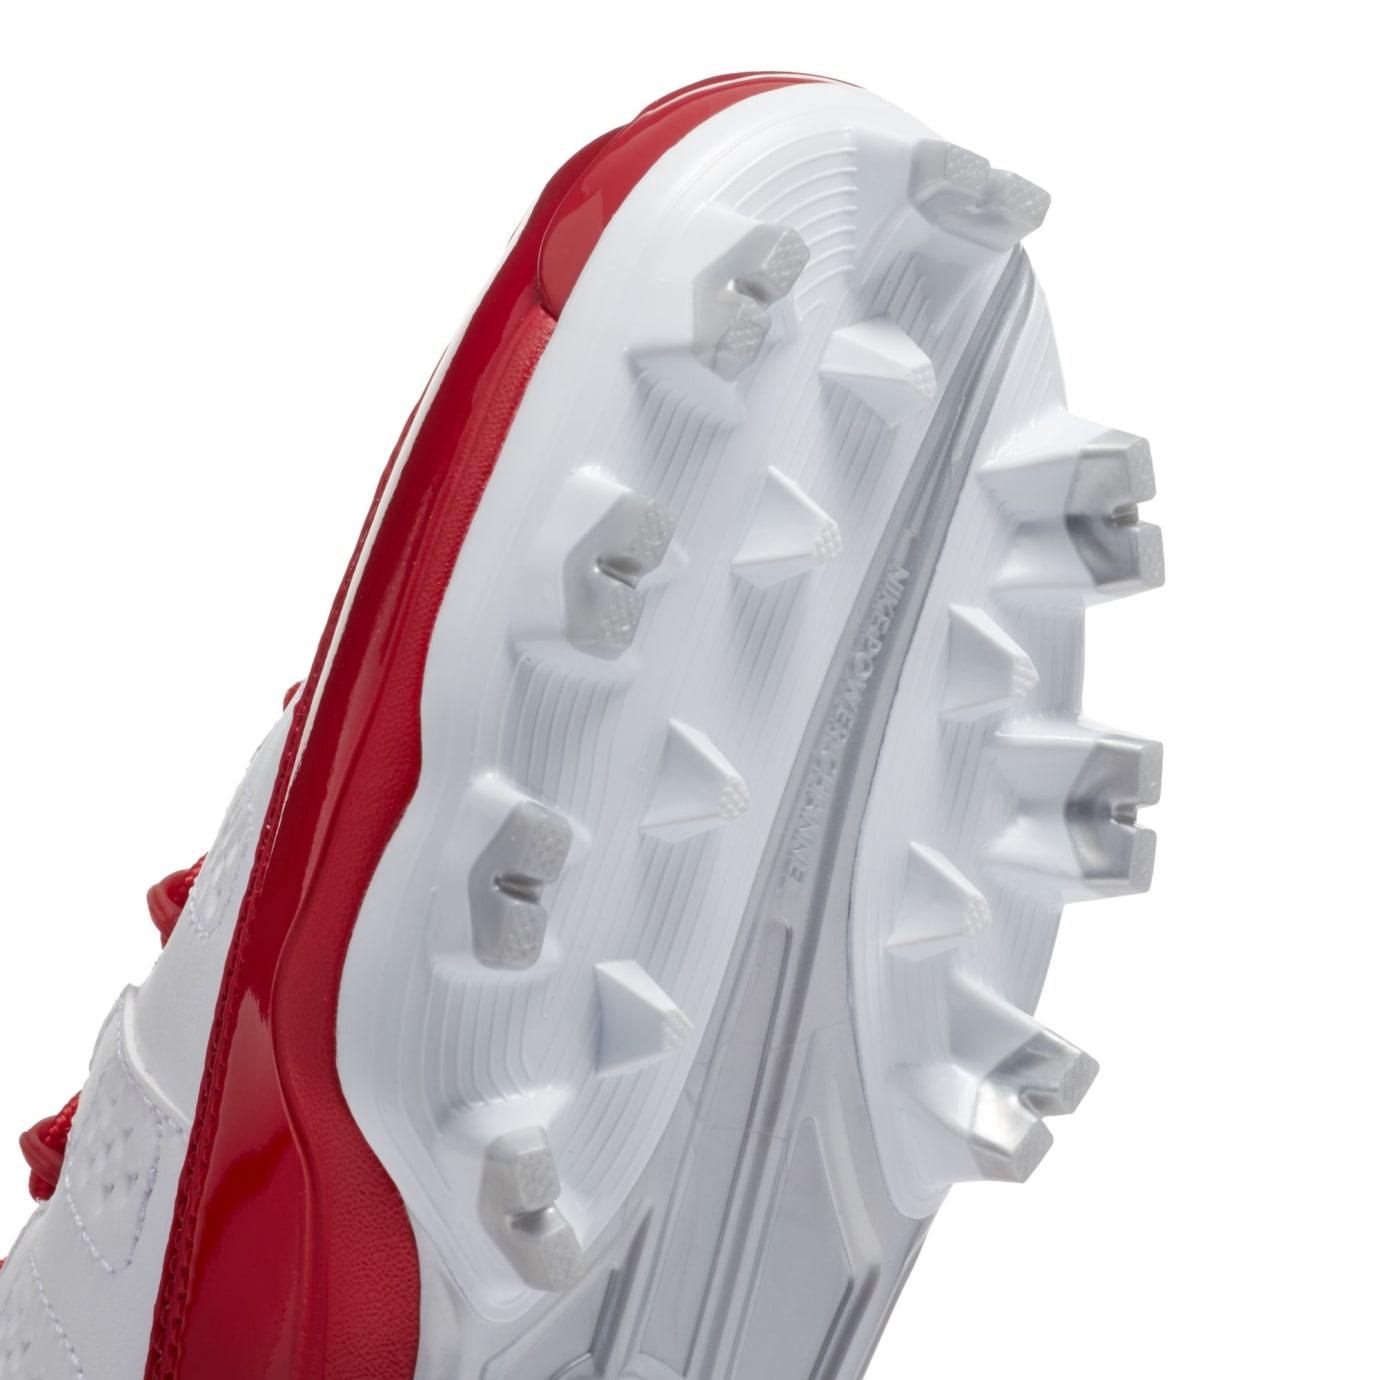 Air Jordan 9 IX MCS Baseball Cleats Red Cleat Plate